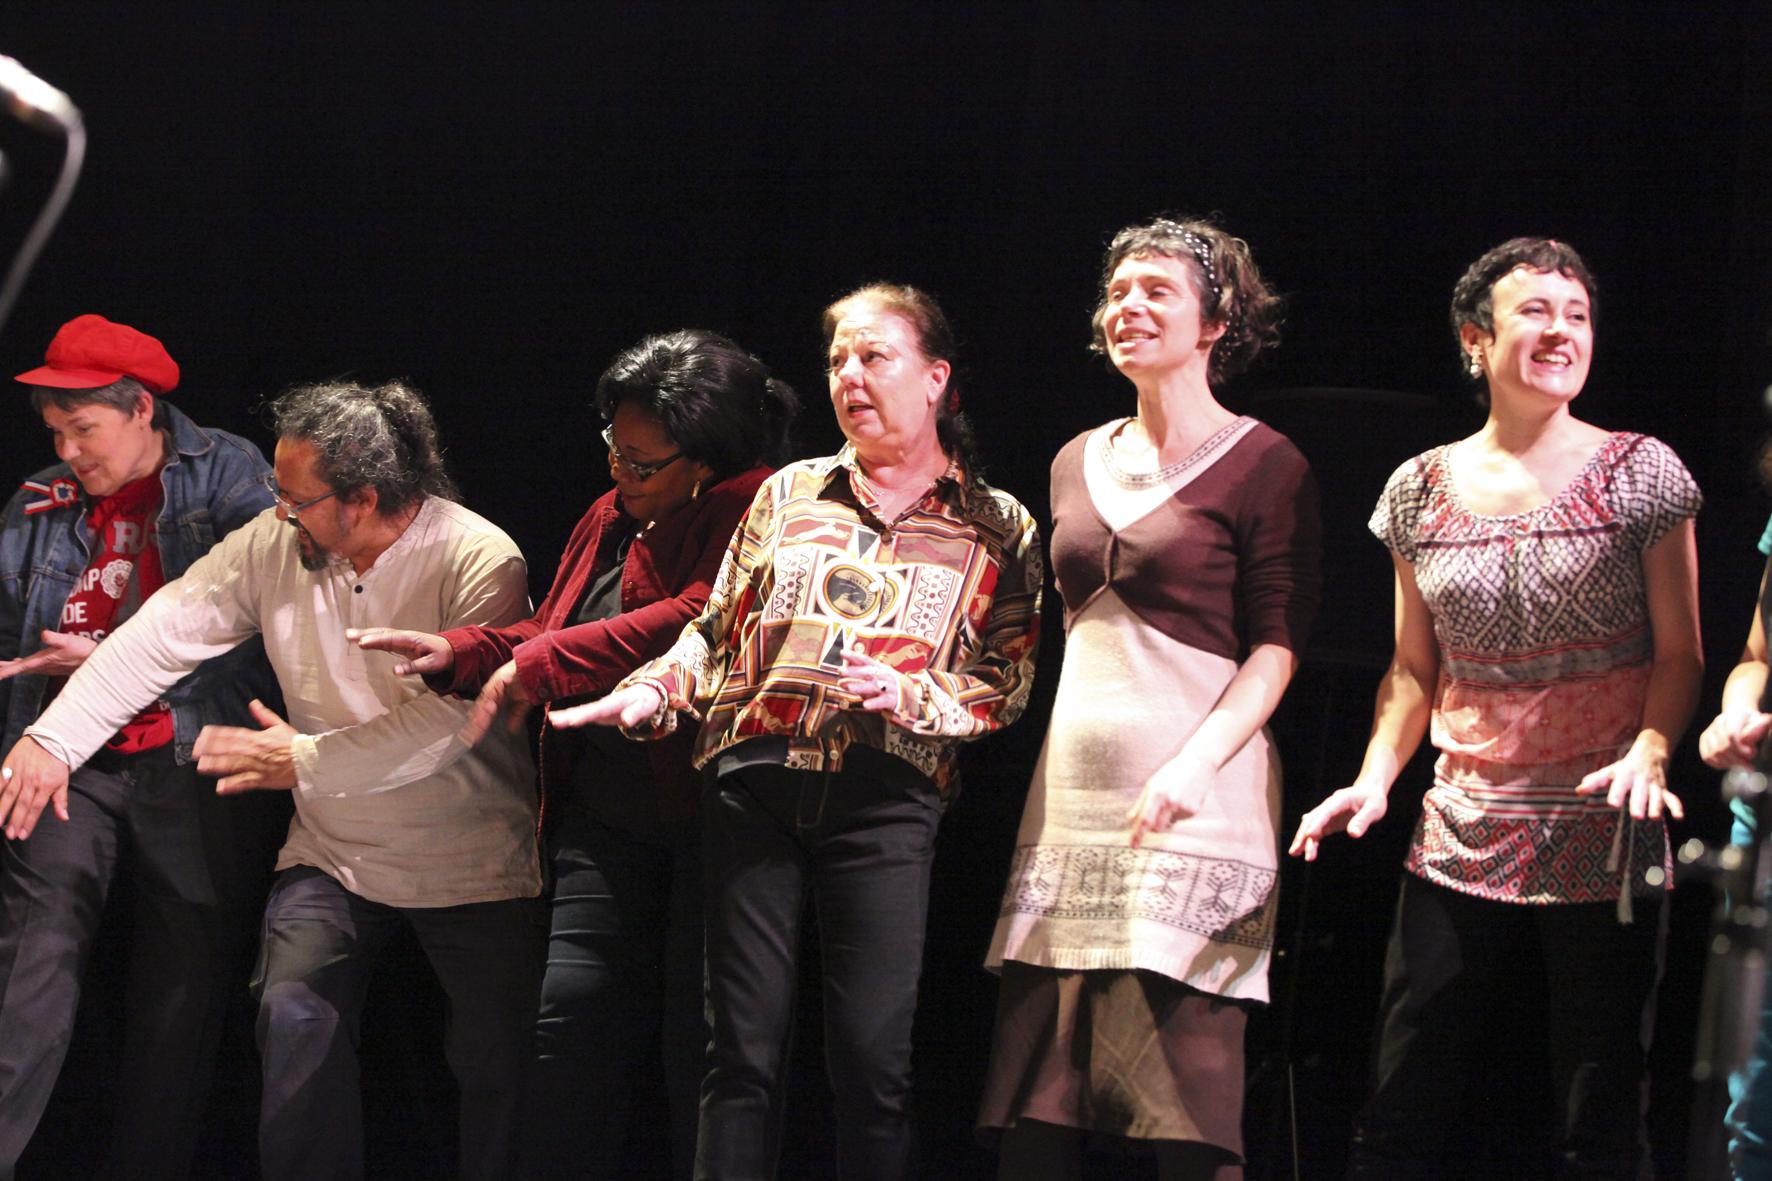 Voix et Rythme 2014-photo djamila calin (75 sur 89).jpg